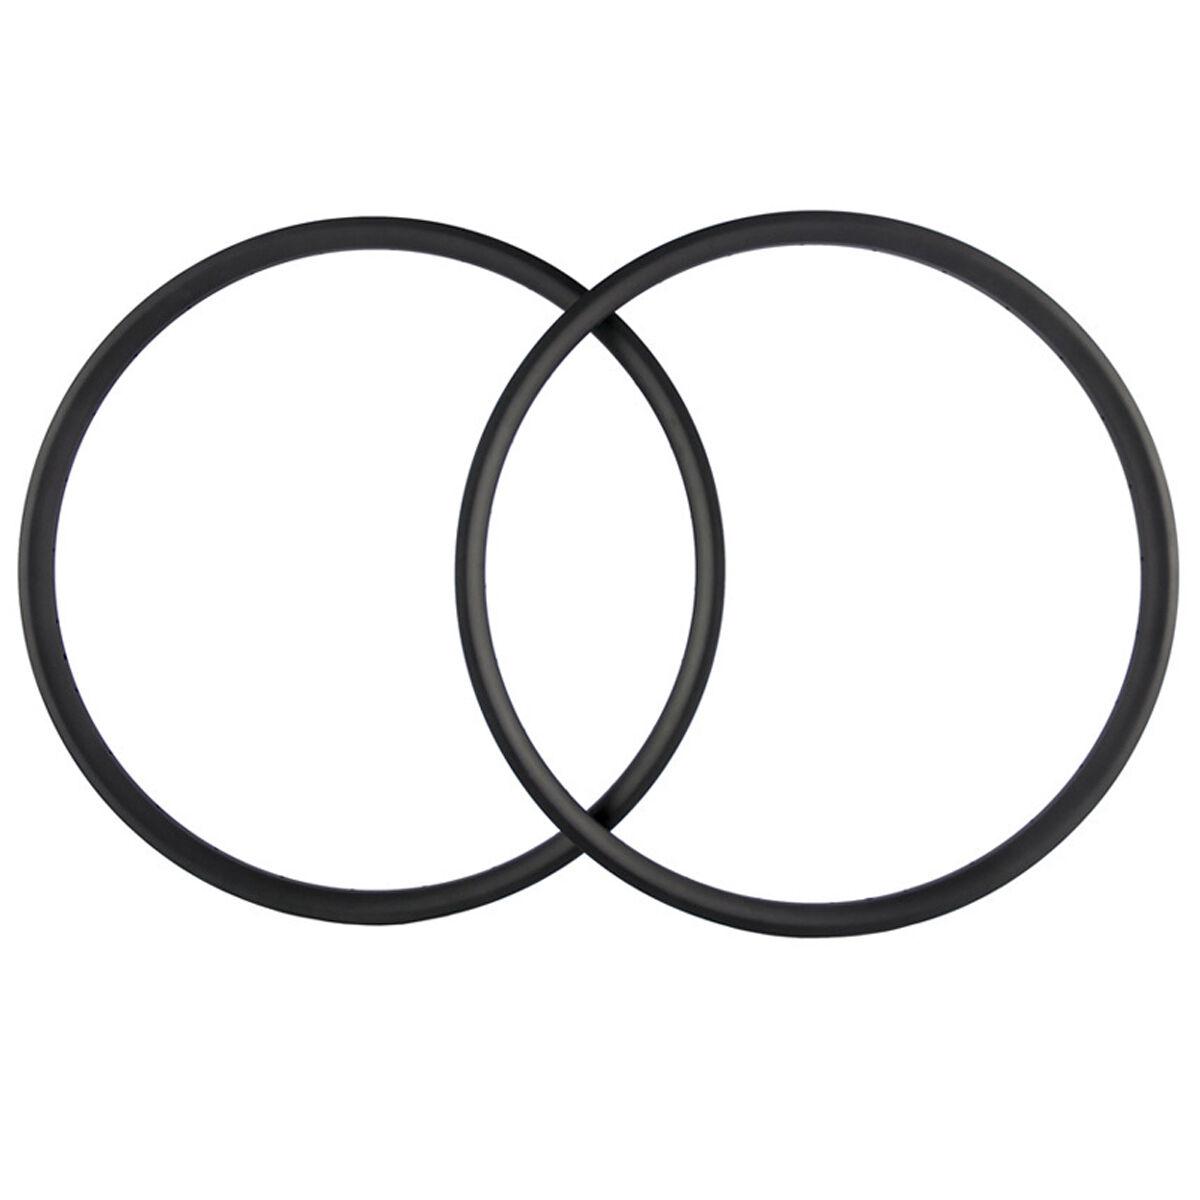 Mountian Bike Carbon Rim Hookless 27.5ER 35mm Width Bicycle Rims Carbon Full Rim